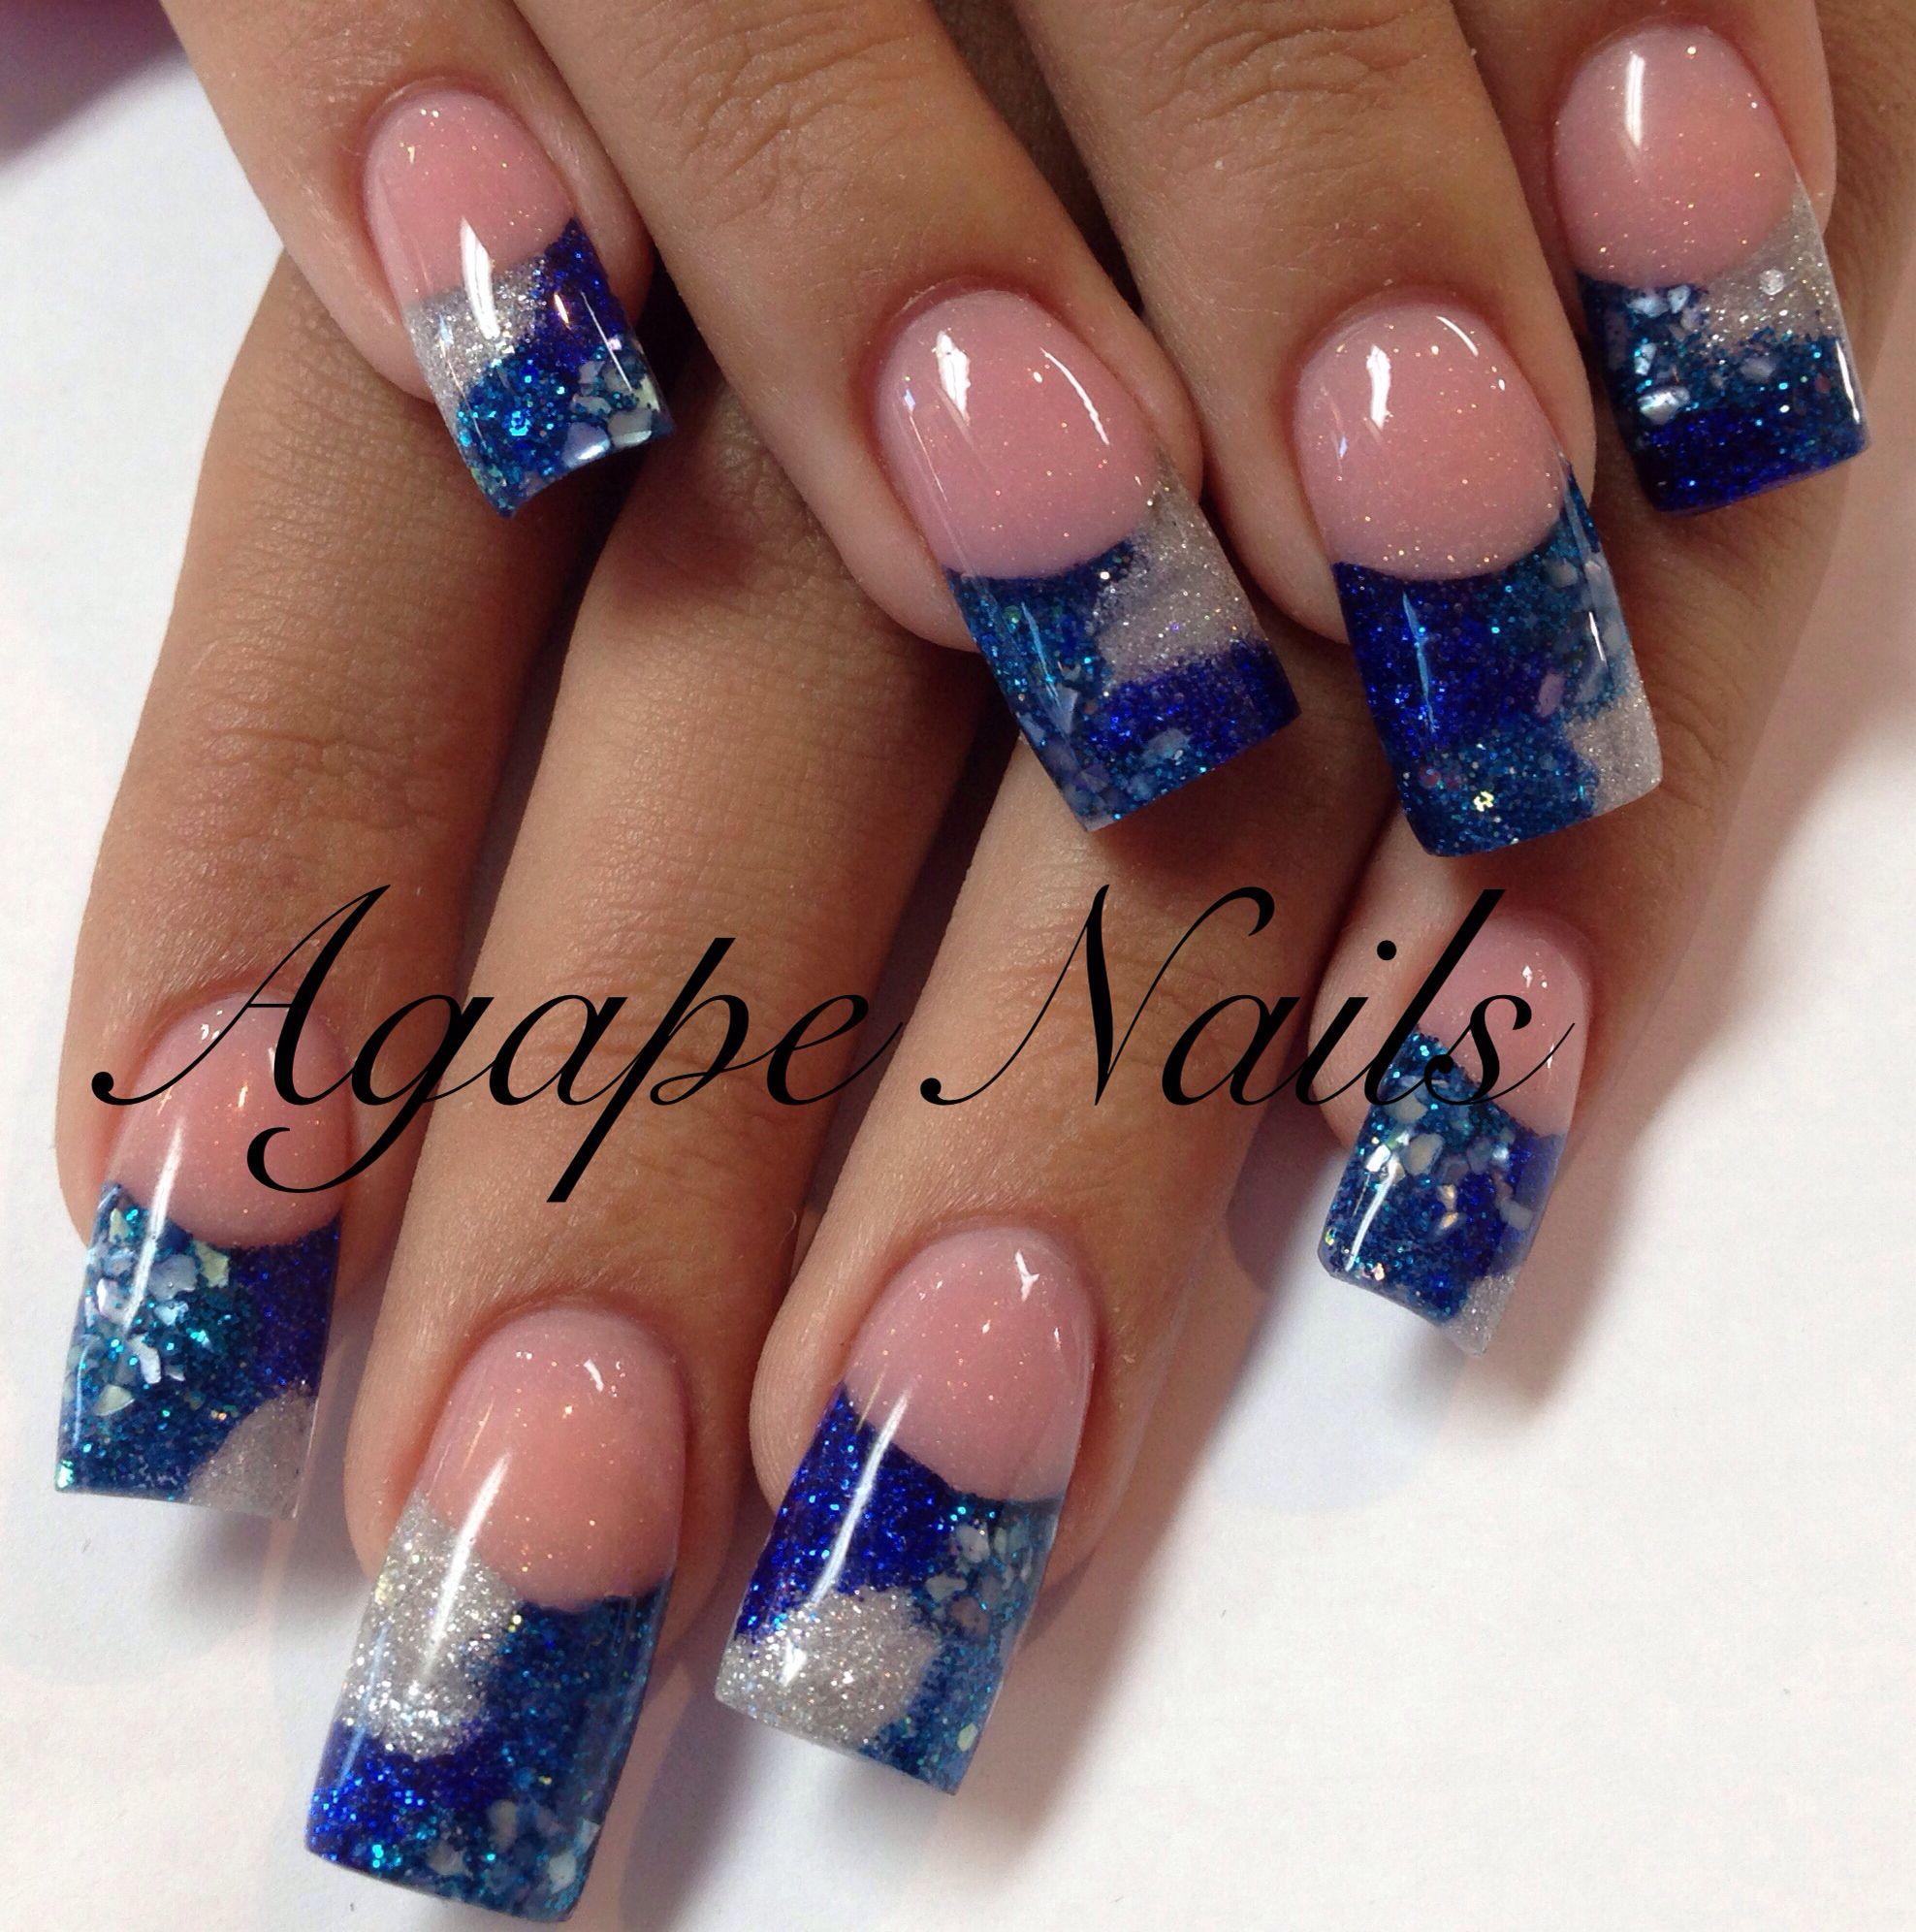 Encapsulation nail art nails pinterest encapsulated nails encapsulation nail art prinsesfo Choice Image